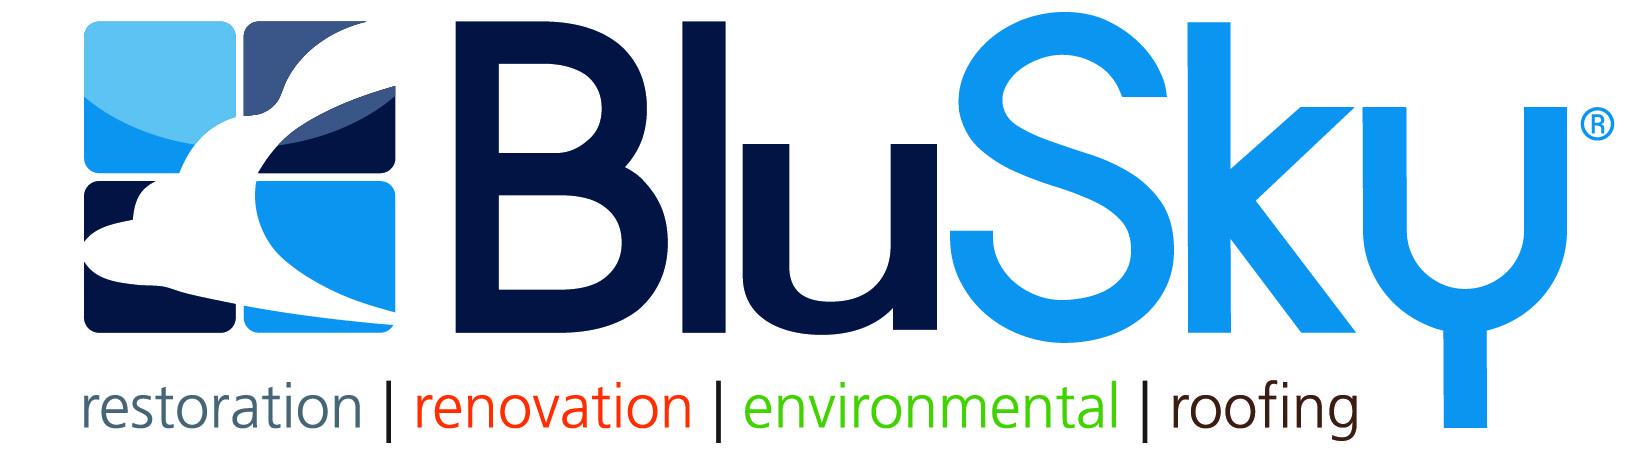 BluSky_logo_tags GOLDjpg